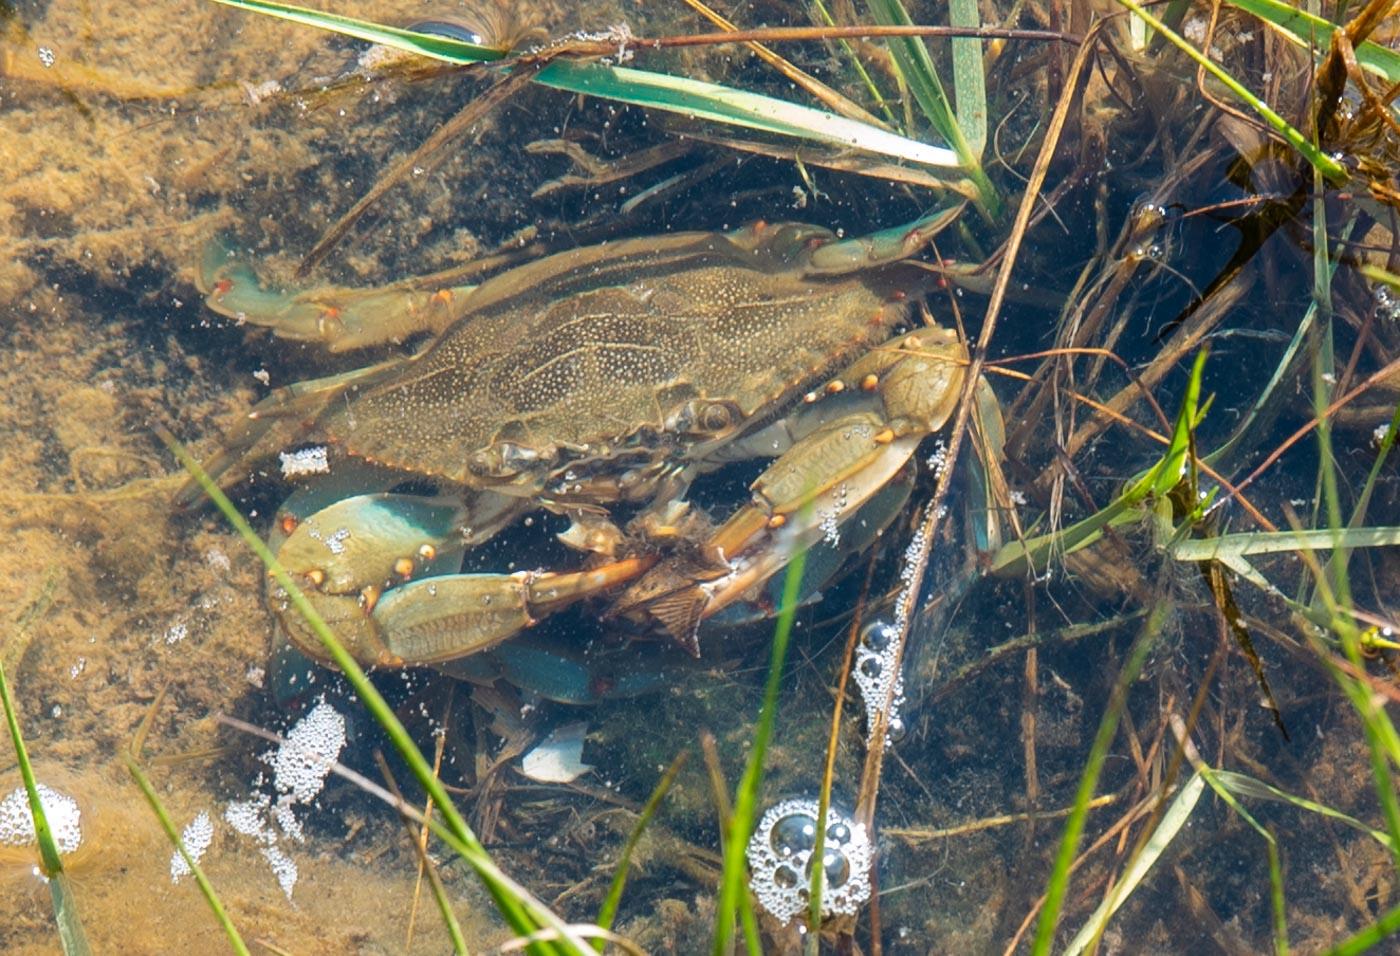 Blue crab eating a razor clam.